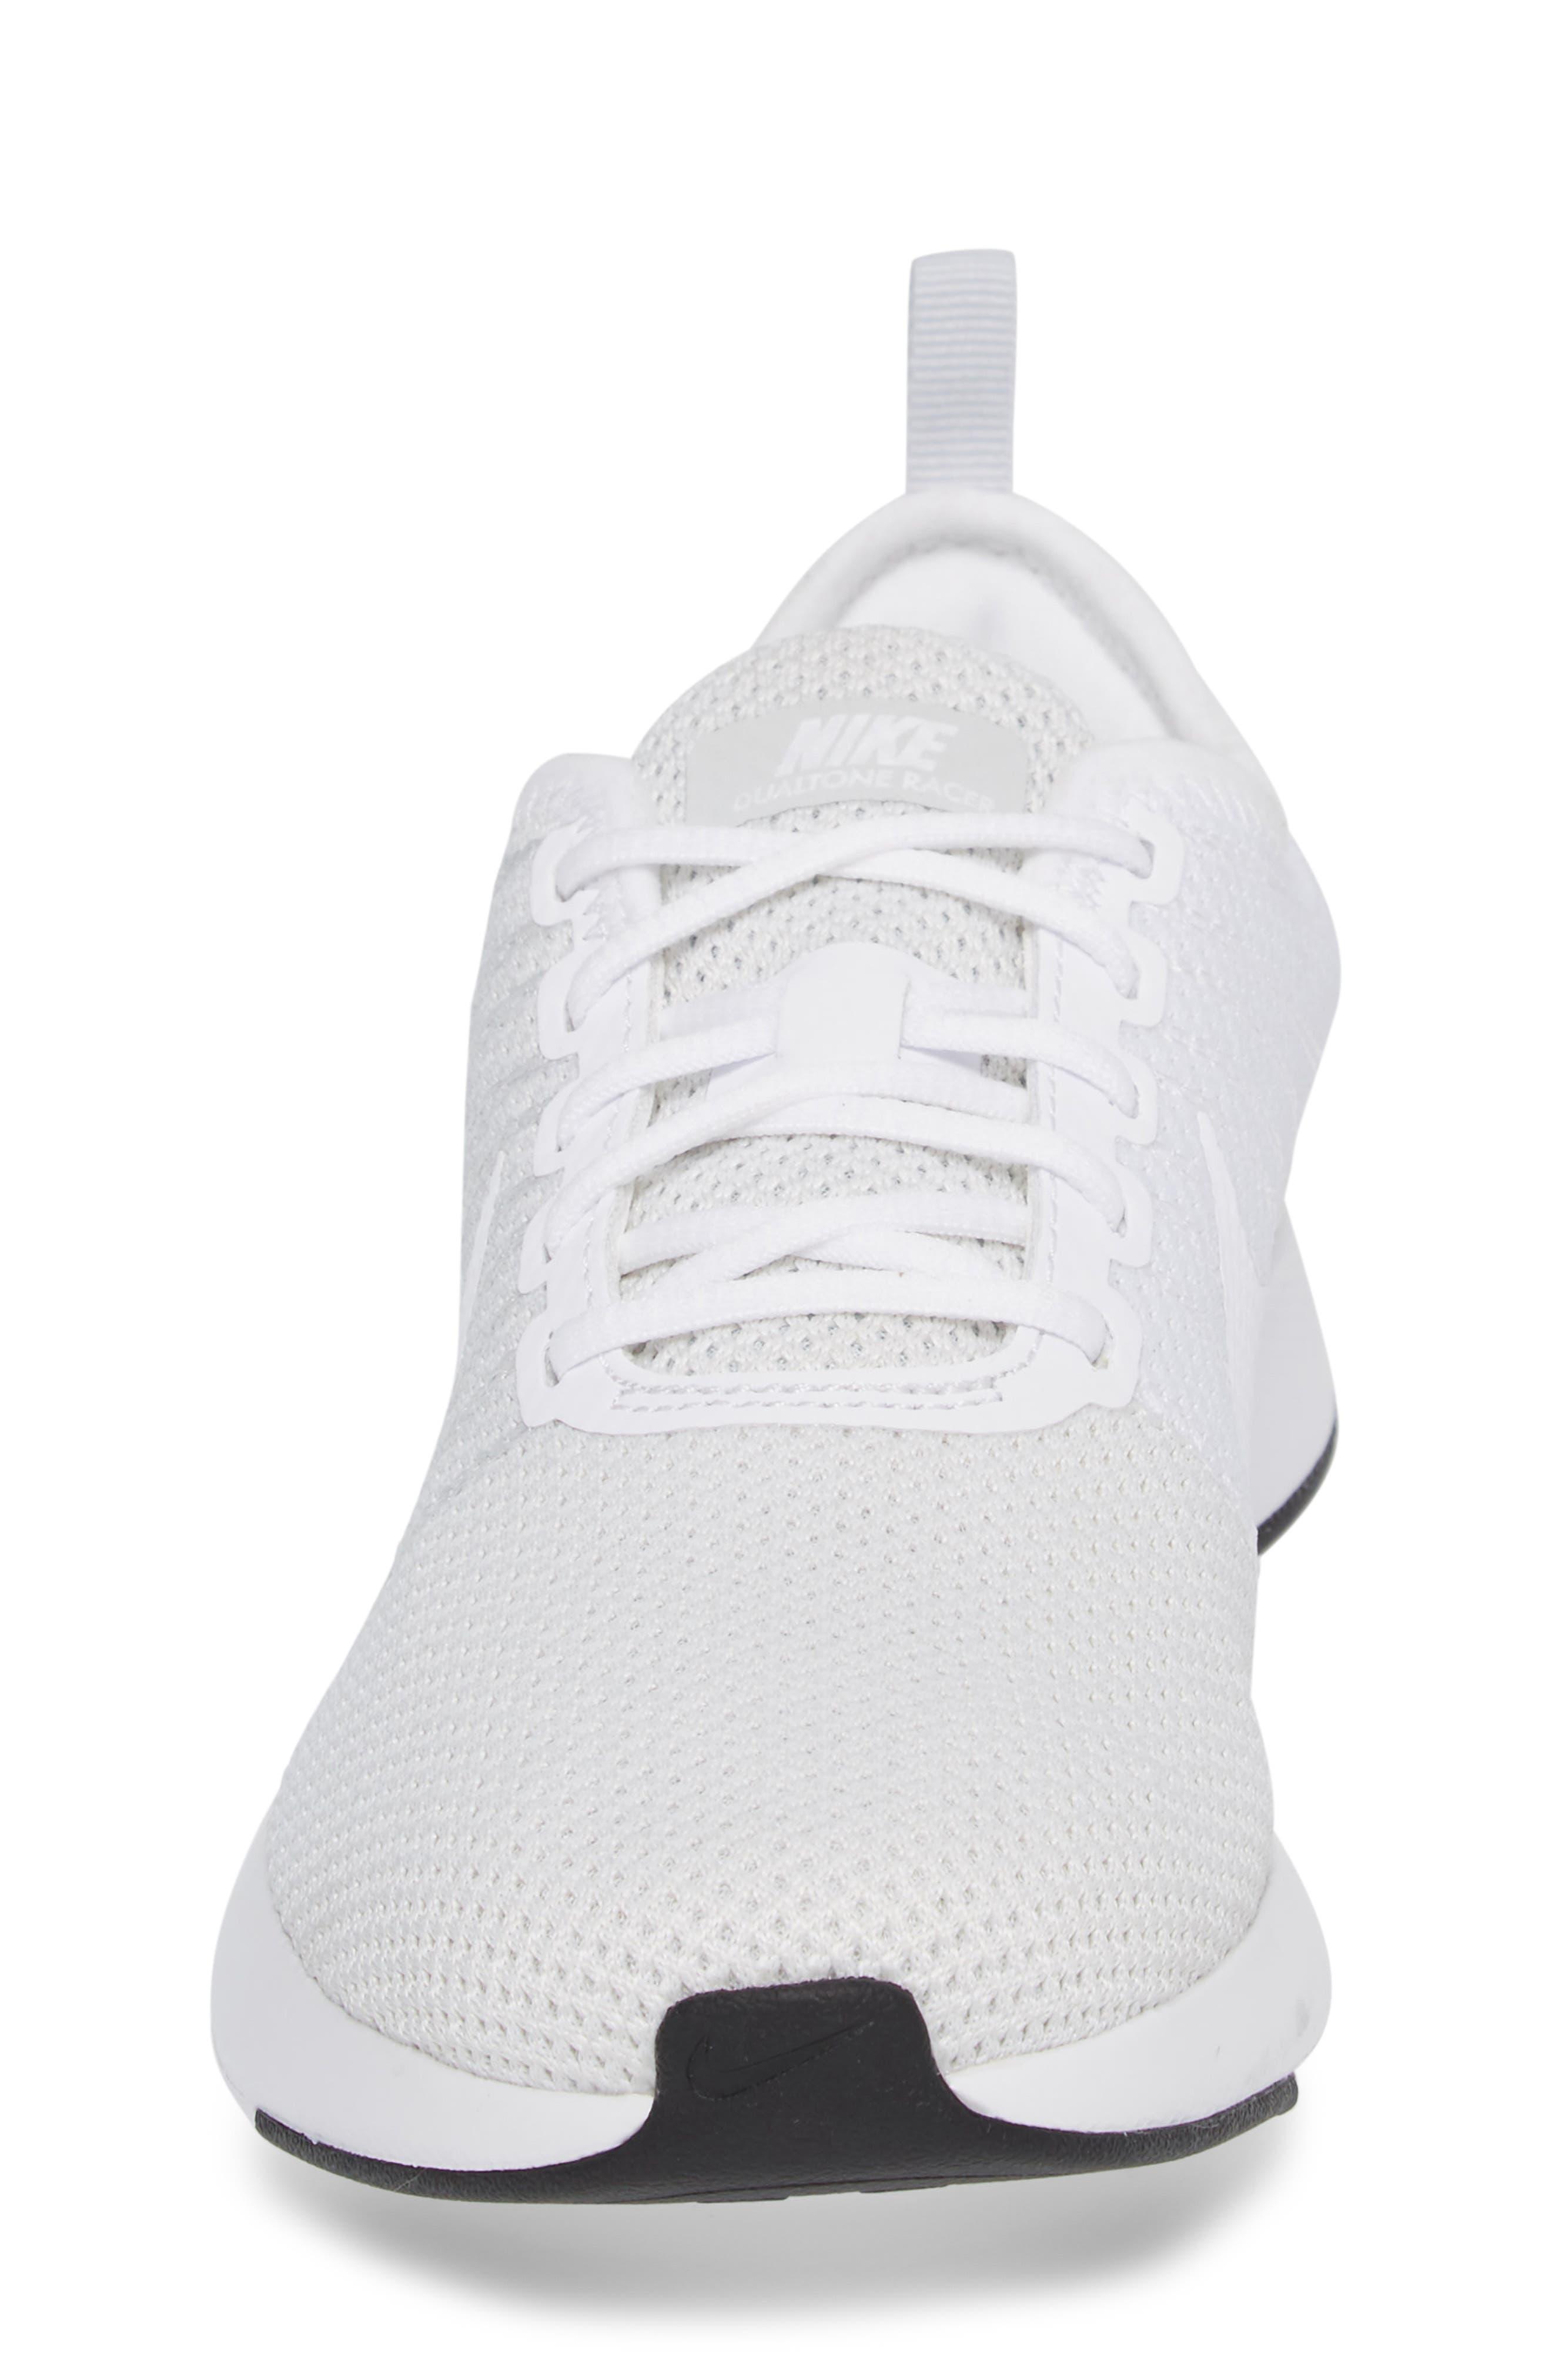 Dualtone Racer GS Sneaker,                             Alternate thumbnail 15, color,